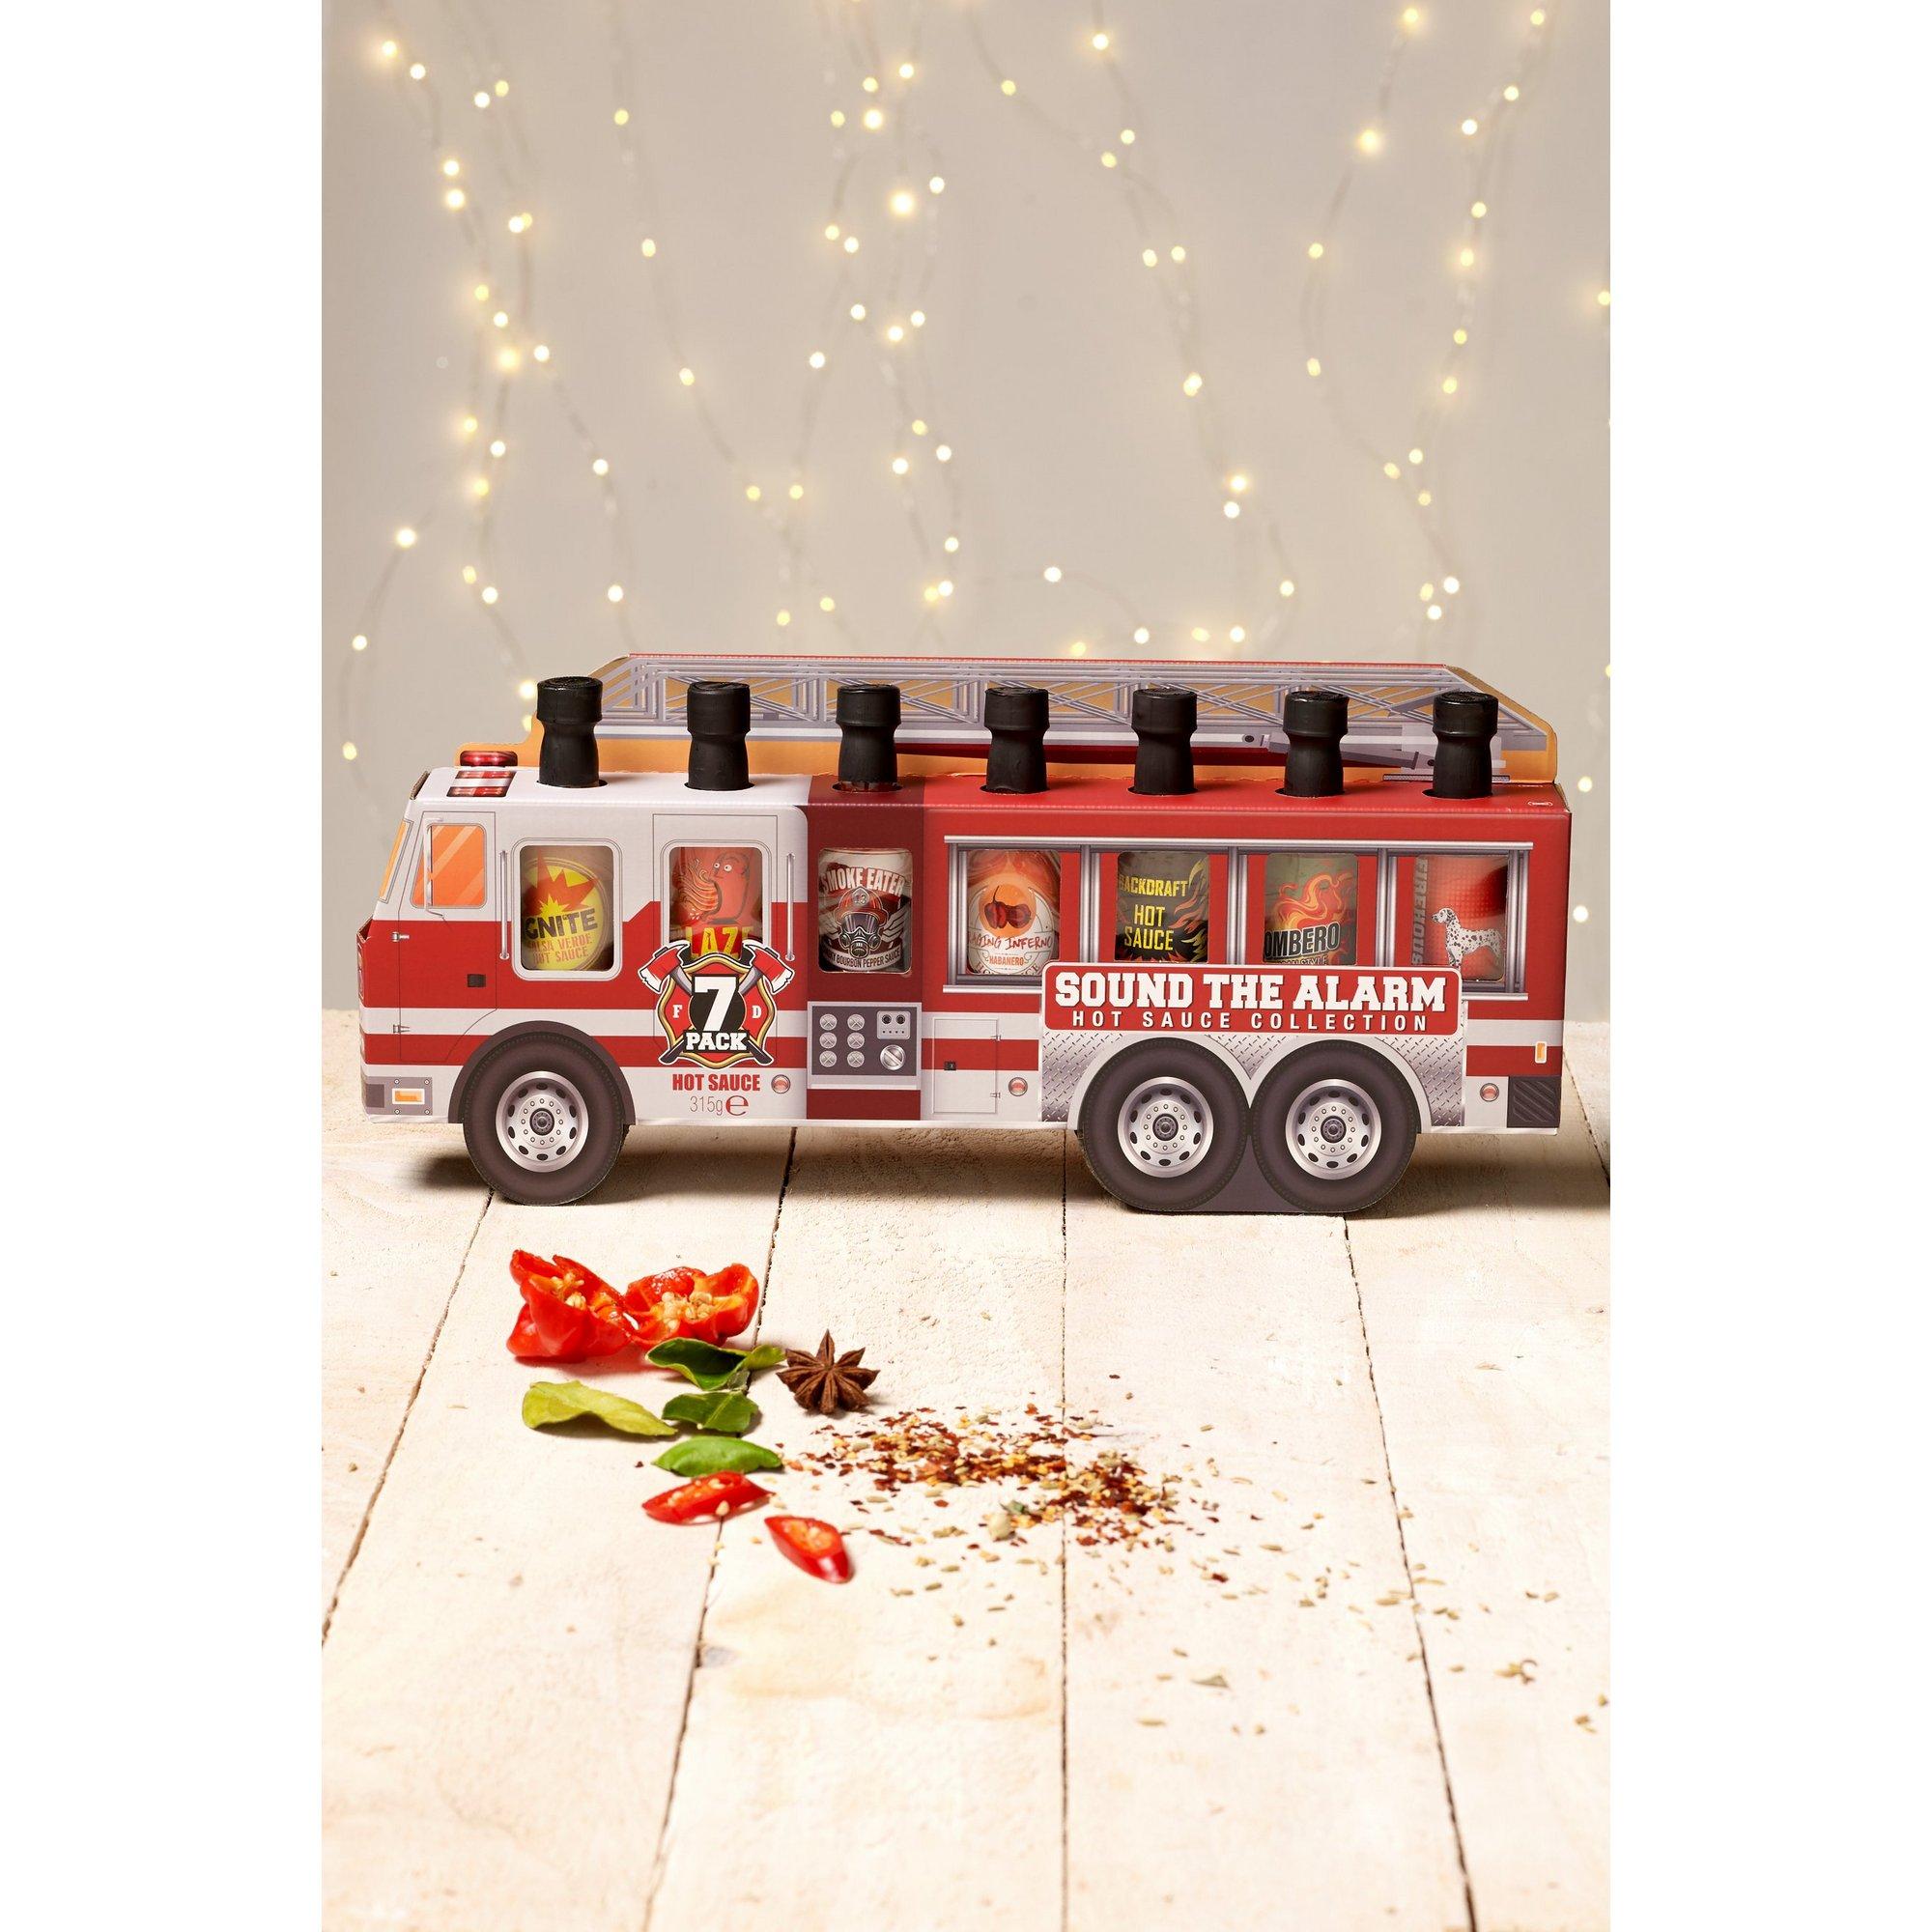 Image of Fire Truck Hot Sauce Sampler